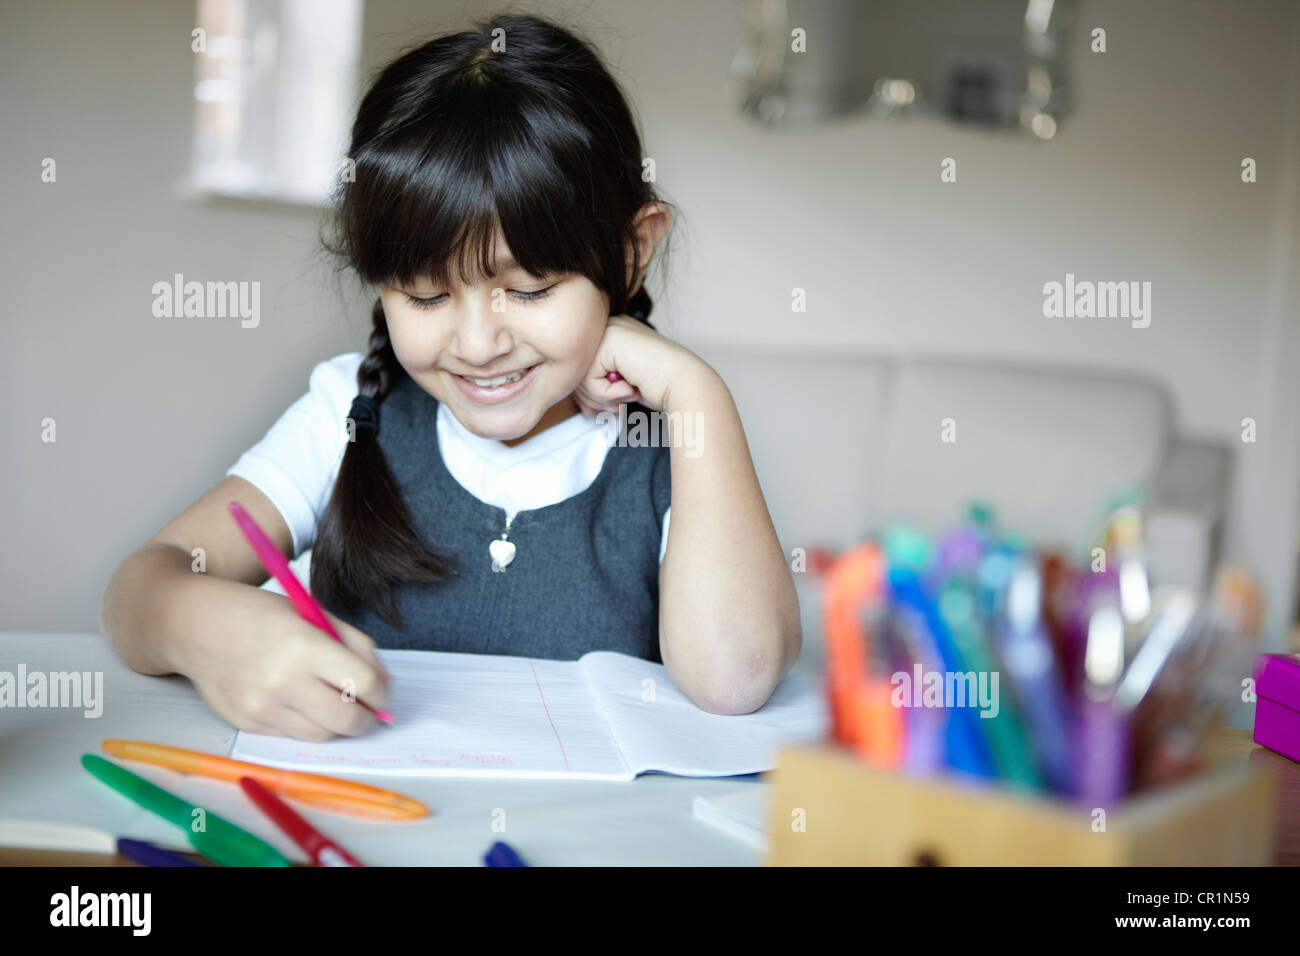 Schoolgirl writing at desk - Stock Image